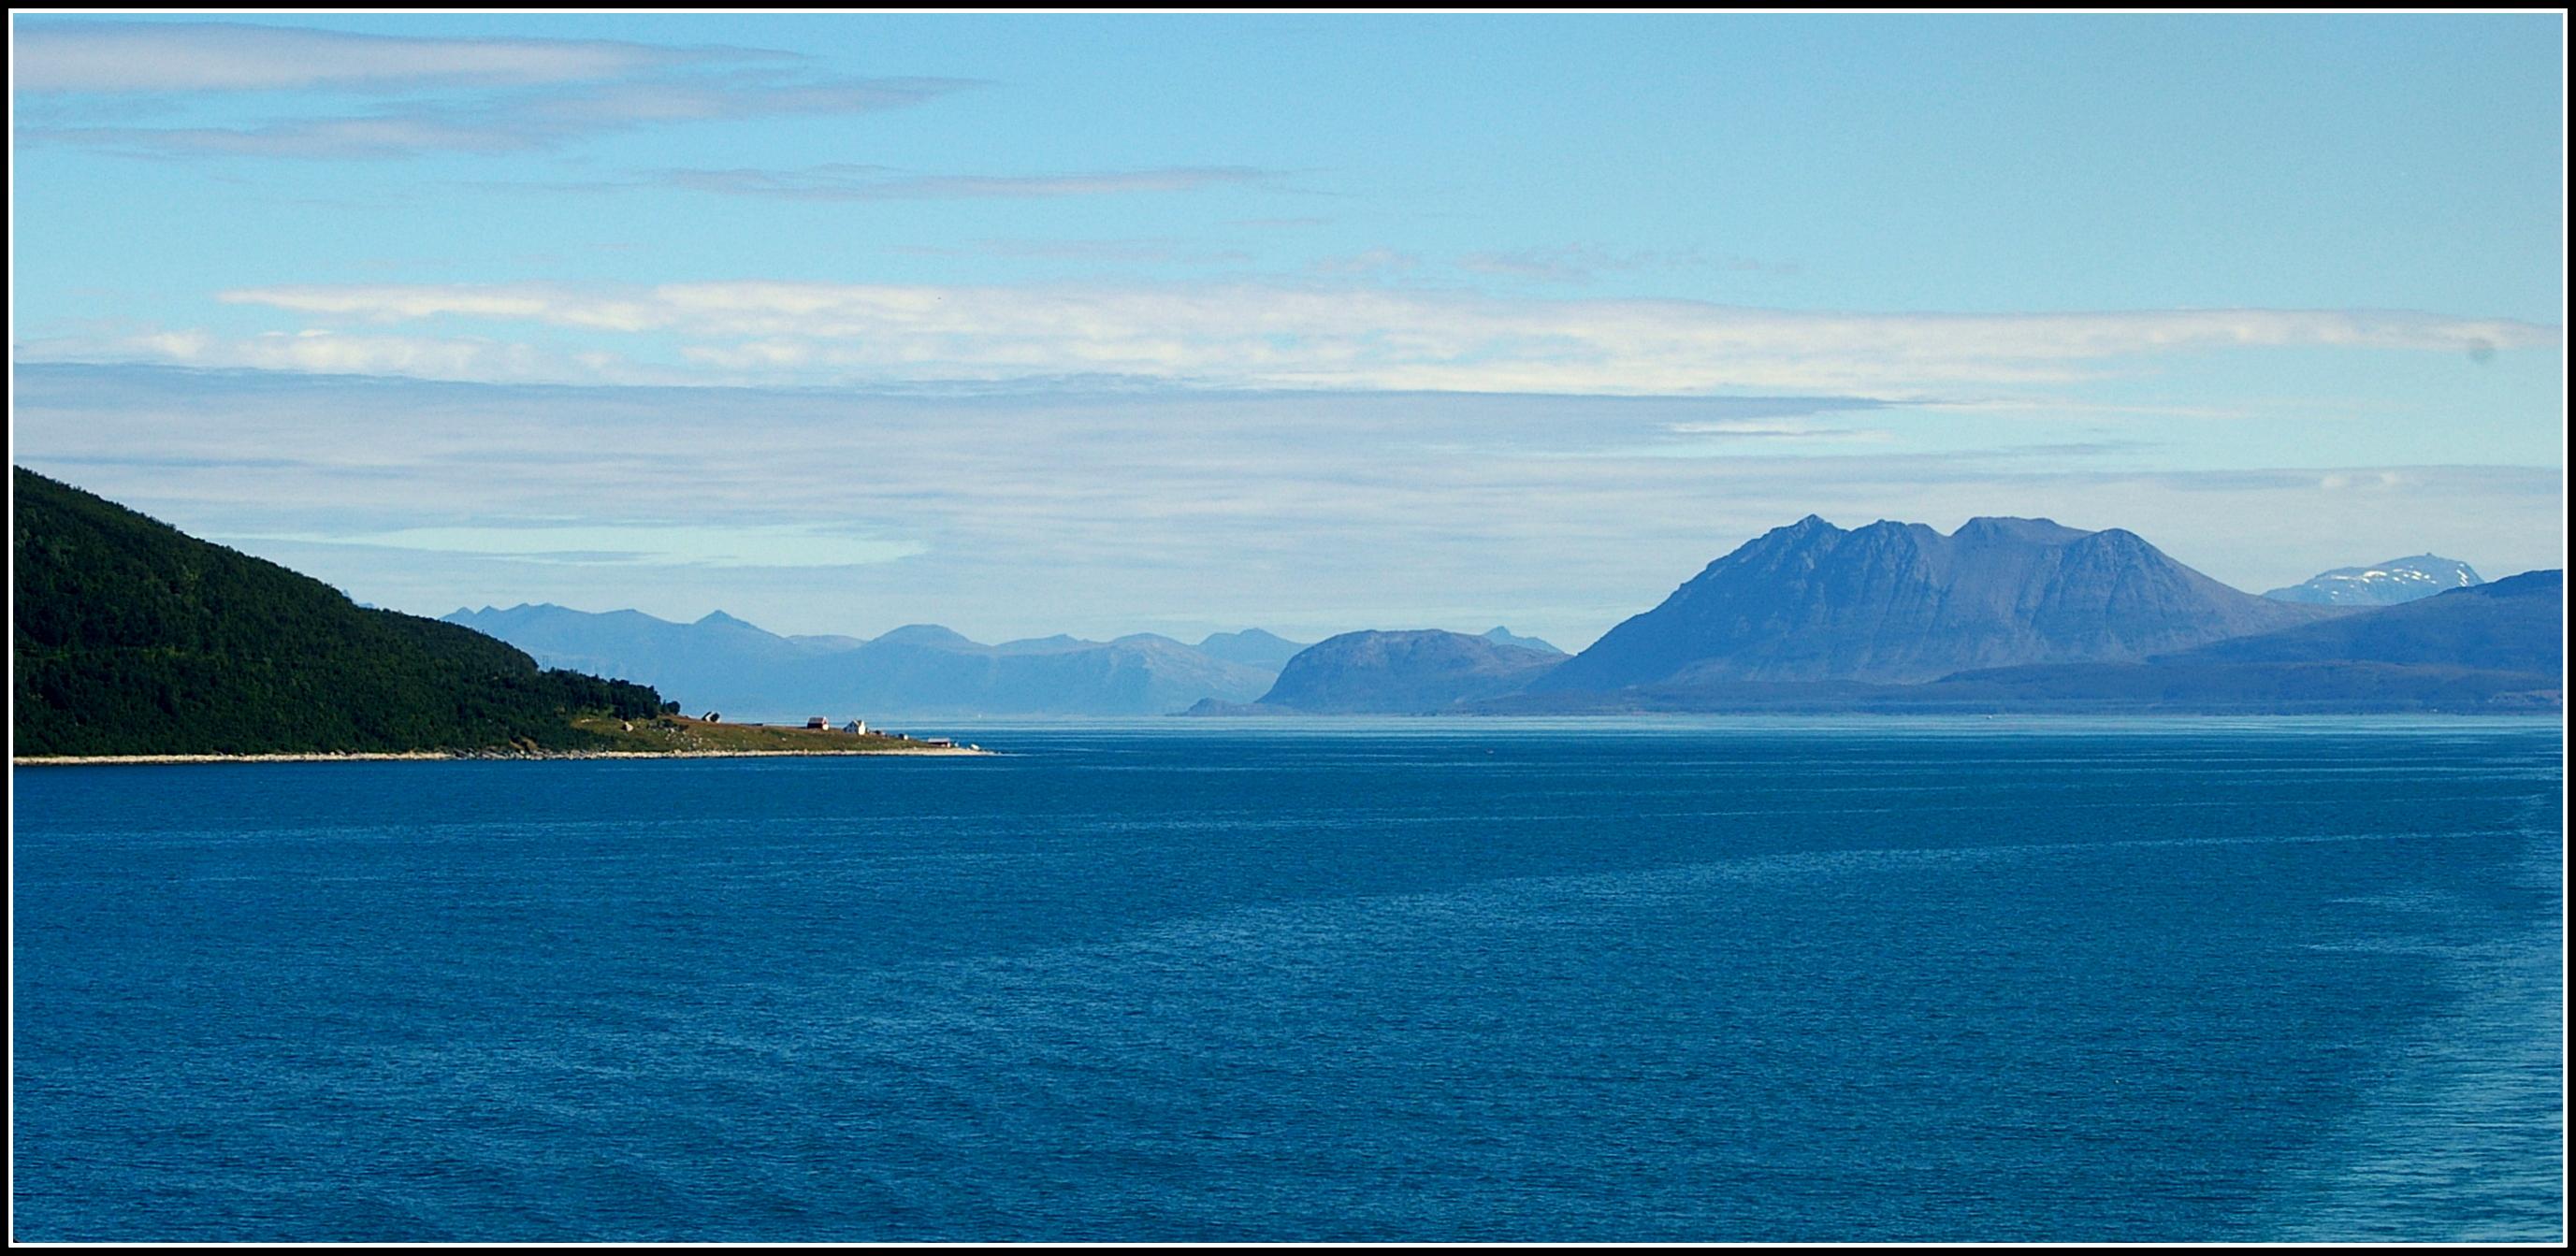 coastline by Mittelfranke